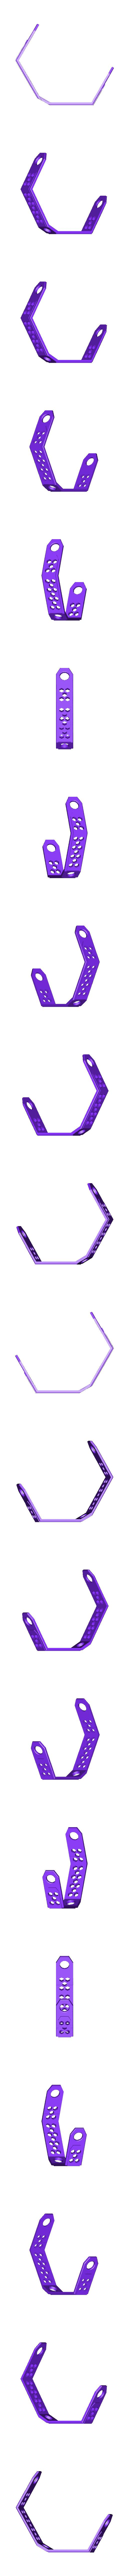 hexaspot_shade_arm.stl Download free STL file HexaSpot Lamp v1 • 3D printing object, marigu